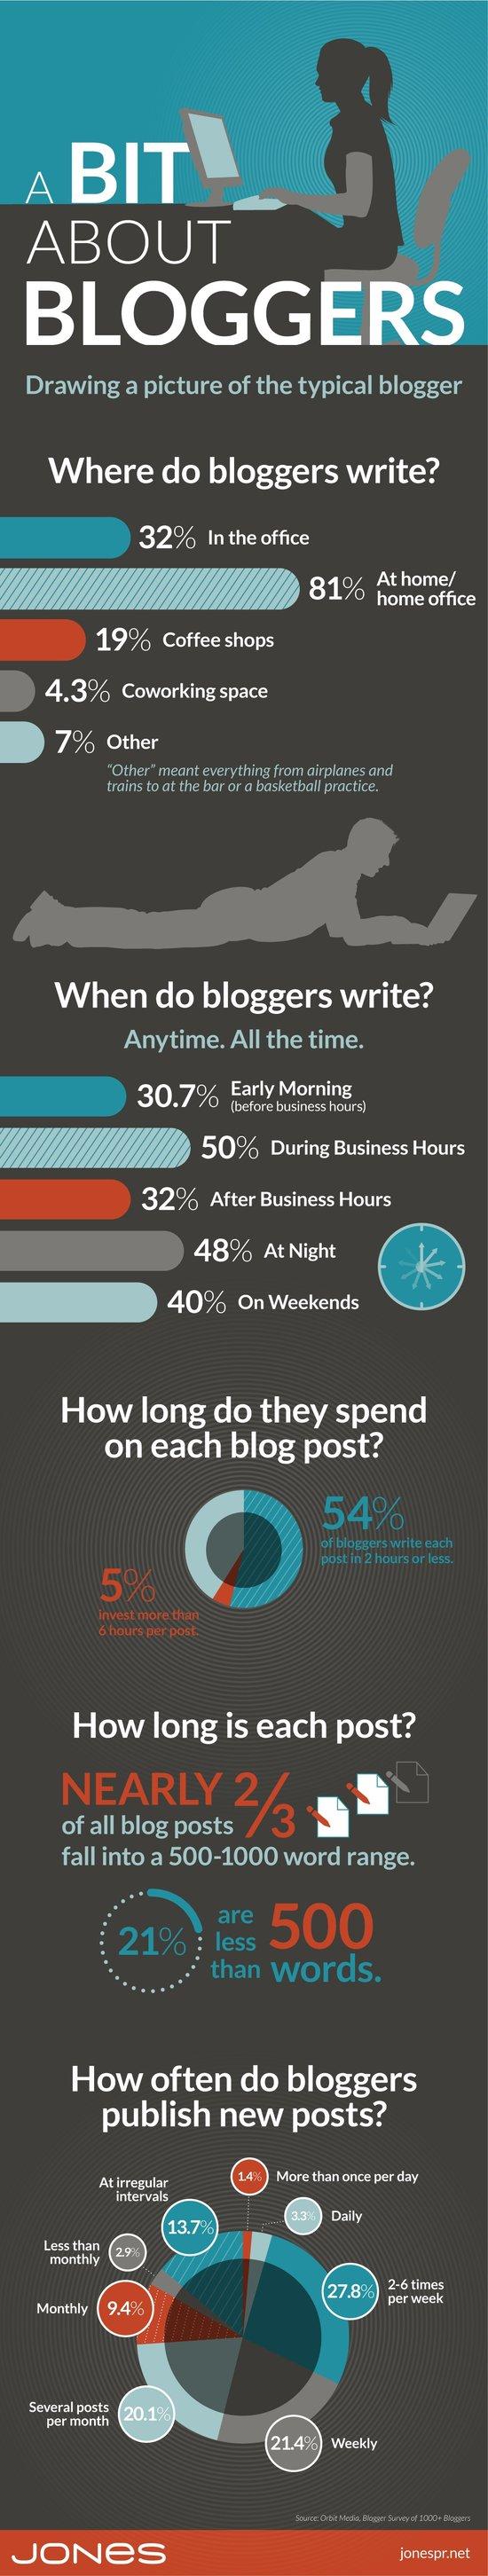 jones-infographic-about-bloggers.jpg